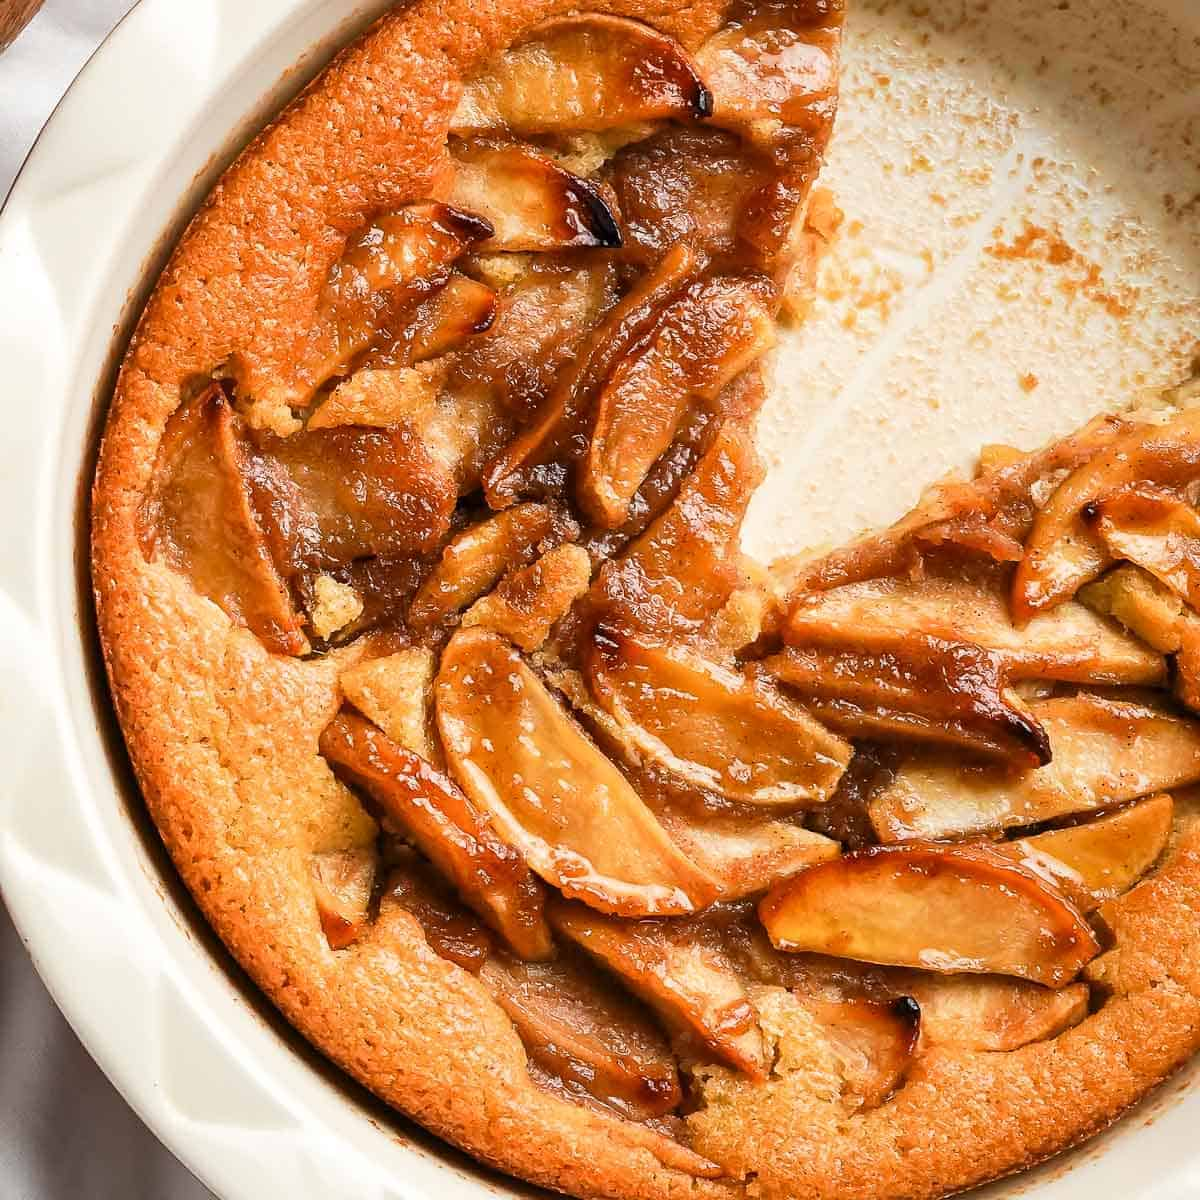 Crazy Crust Apple Pie Close Up in Pan